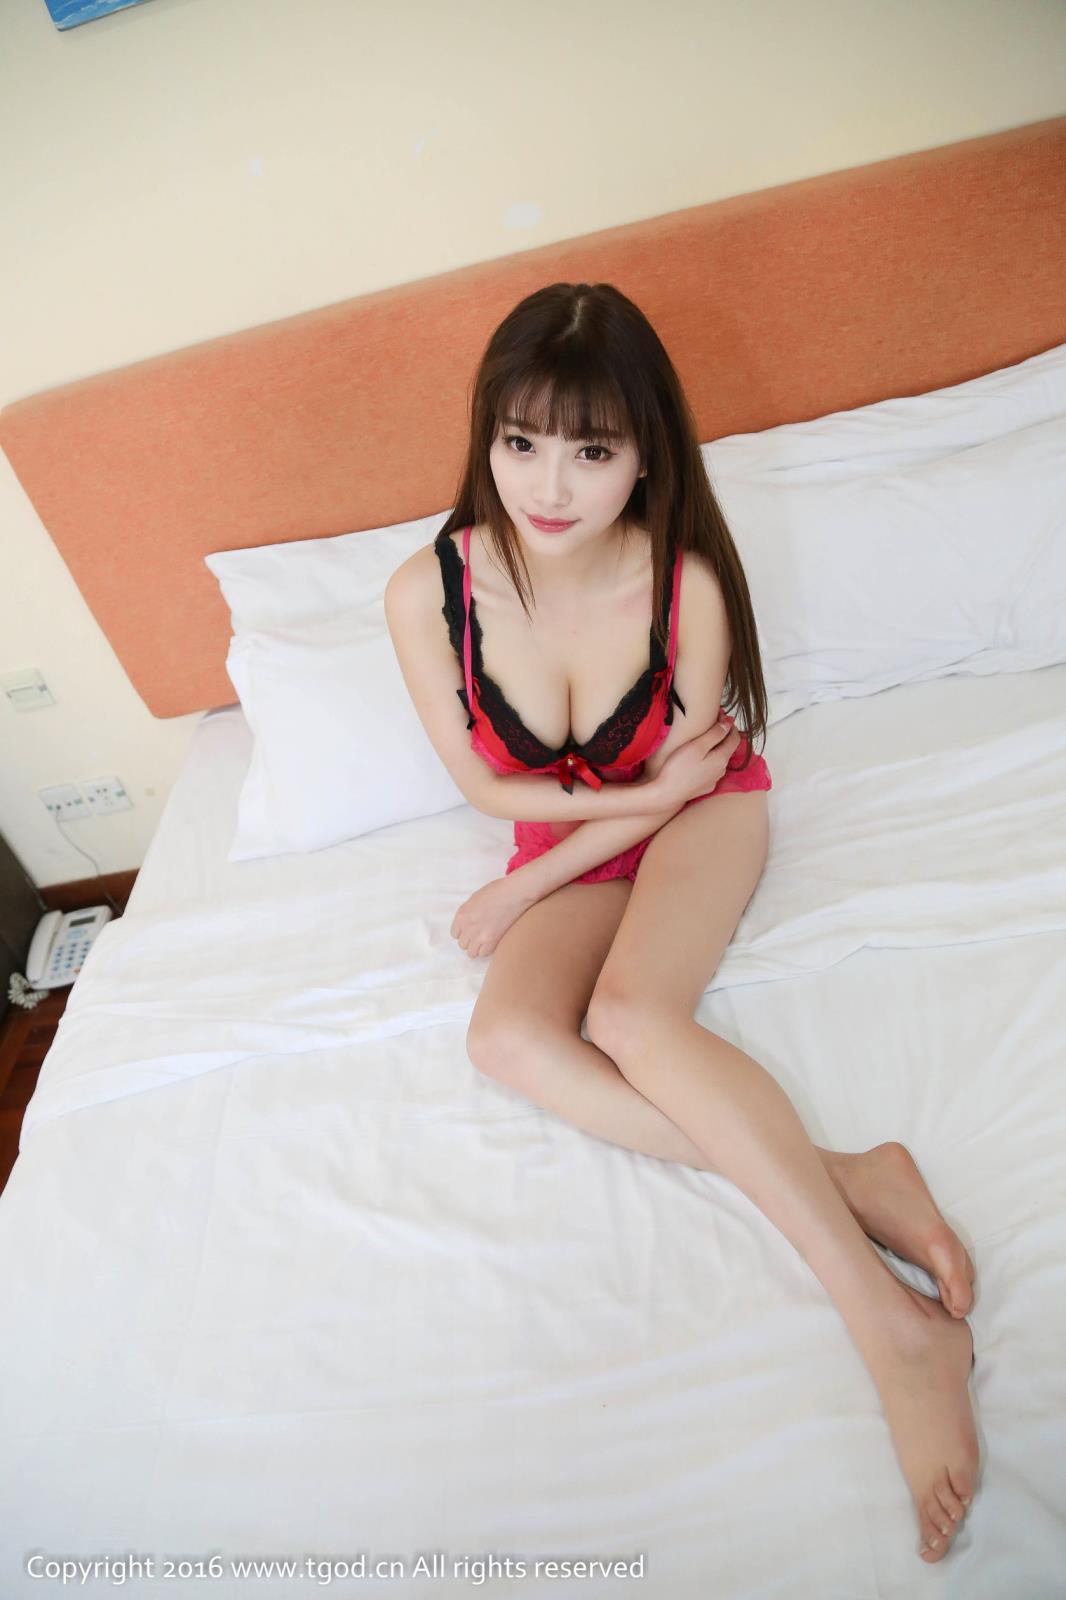 [TGOD推女神] 杨晨晨Sugar小甜心CC女仆装镂空透视情趣内衣制服诱惑